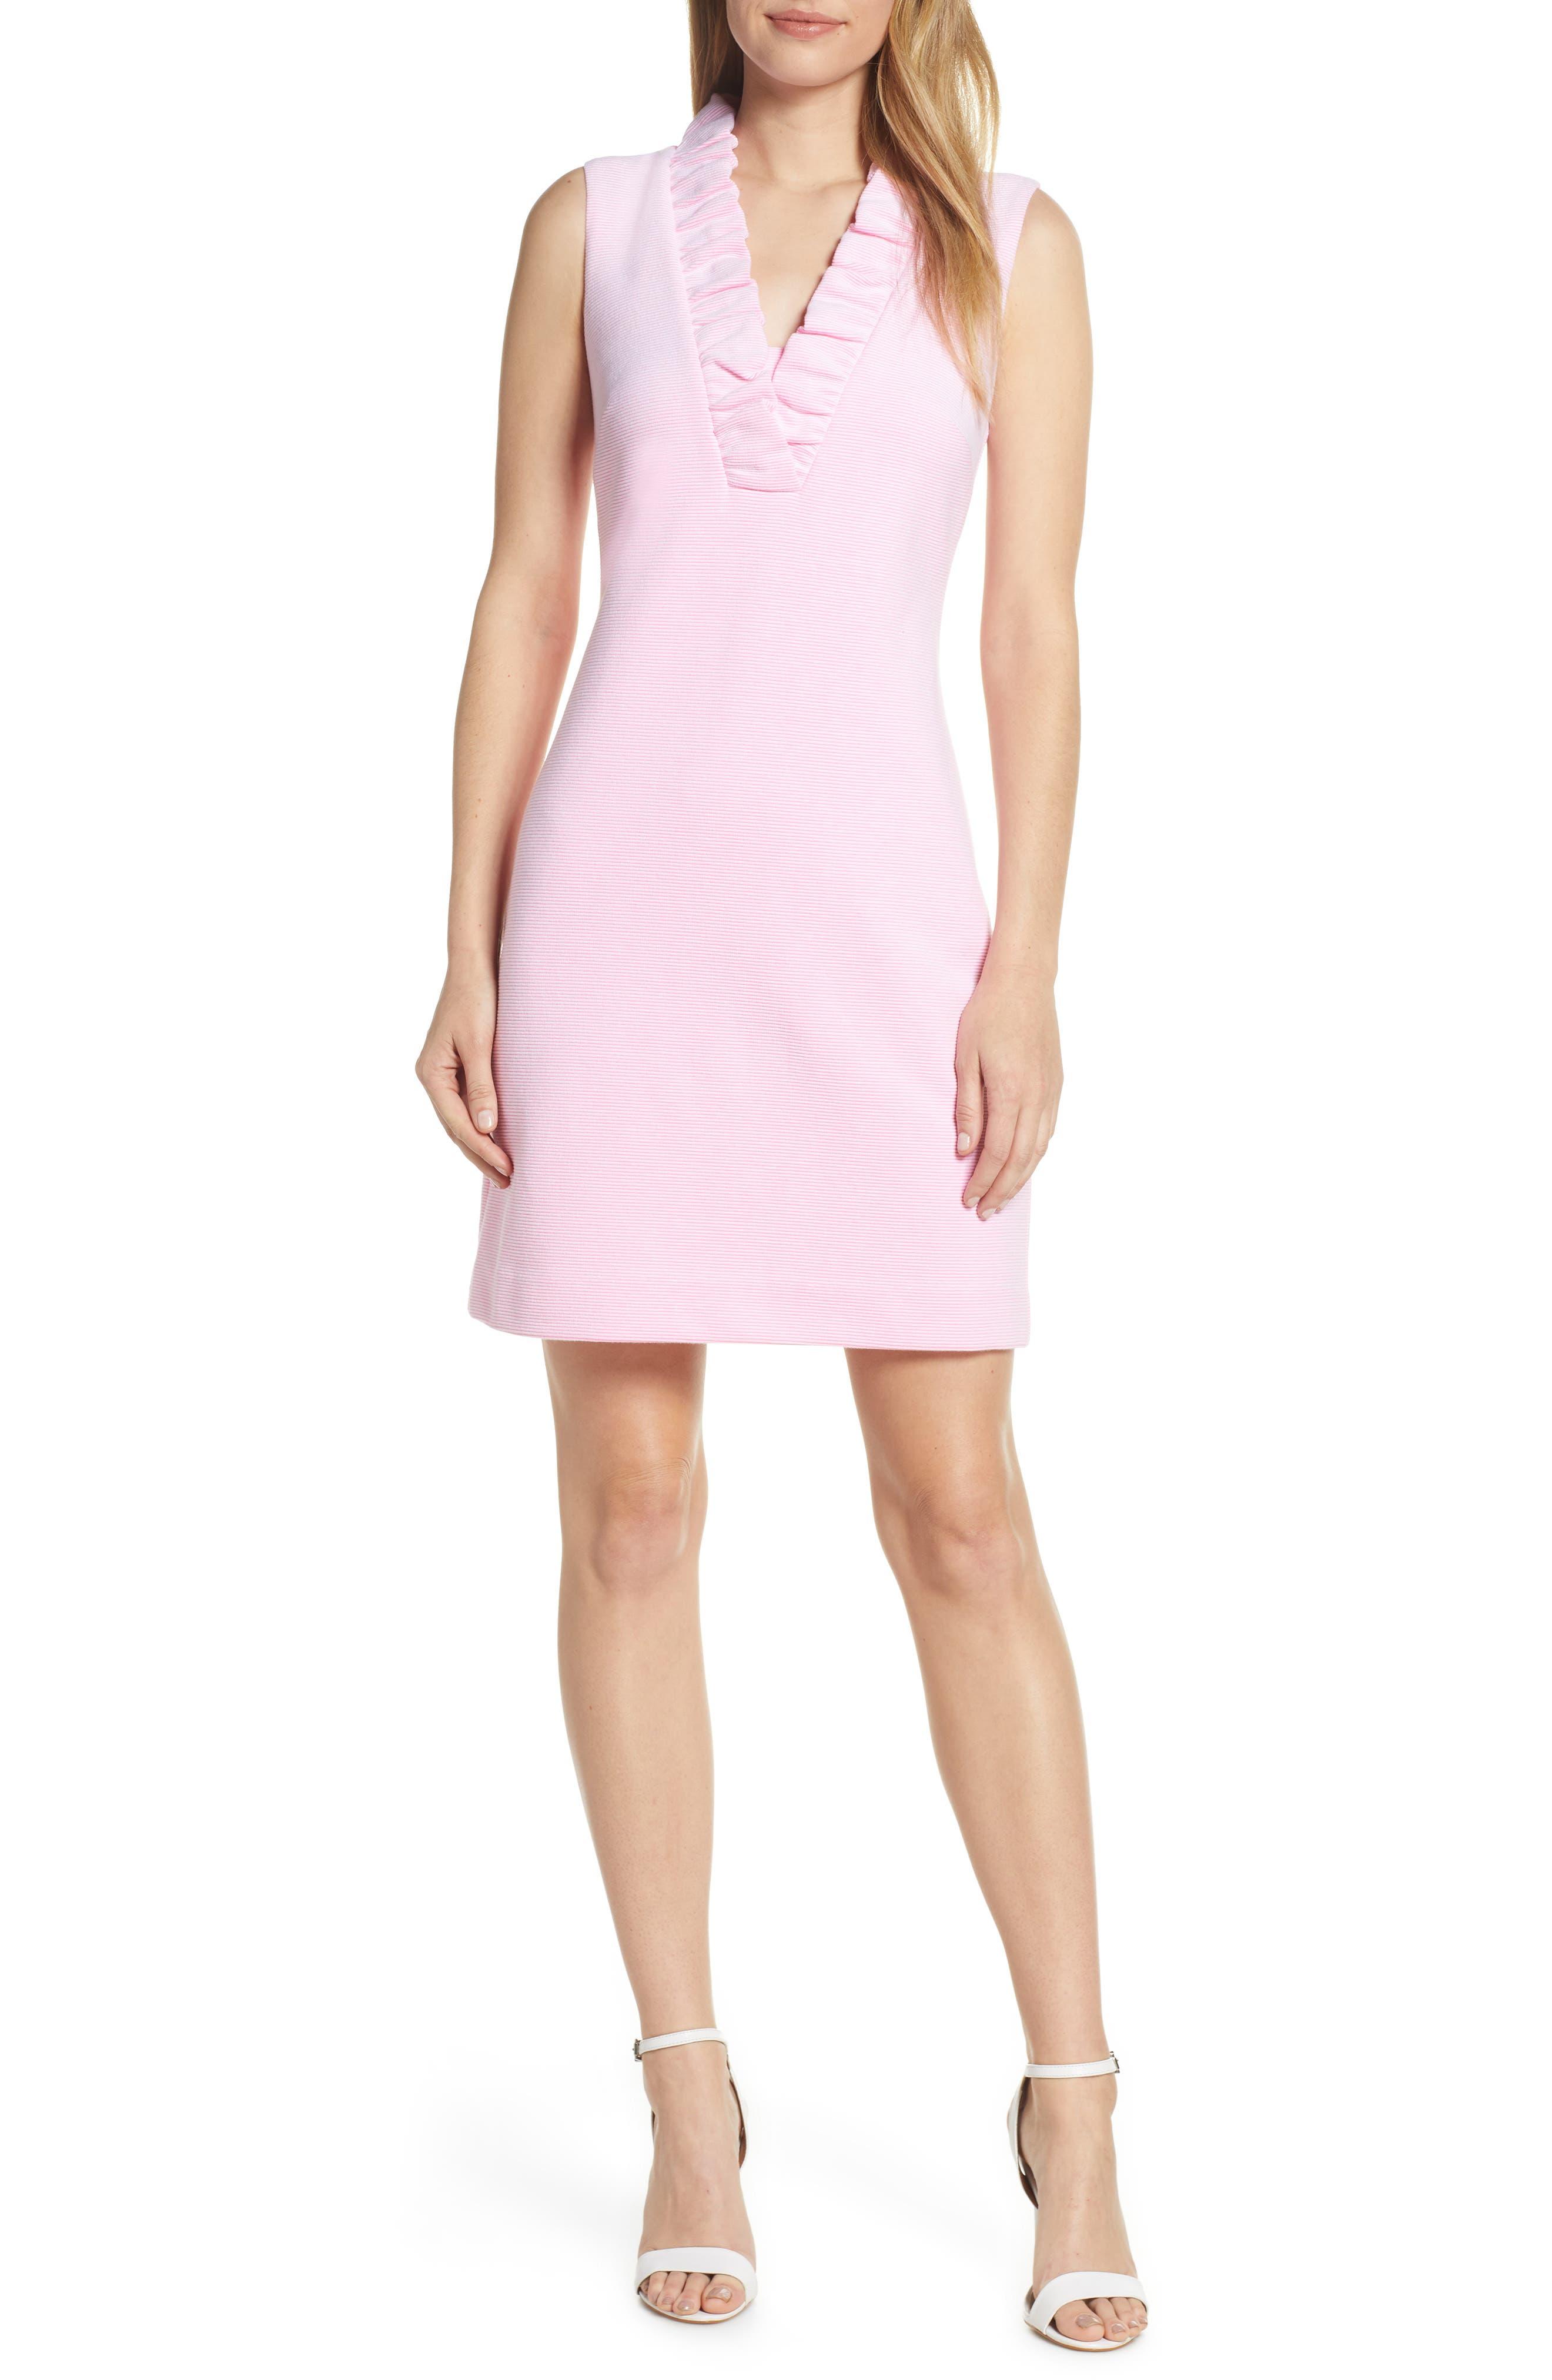 Lilly Pulitzer Tisbury Stripe Ruffle Neck Dress, Pink